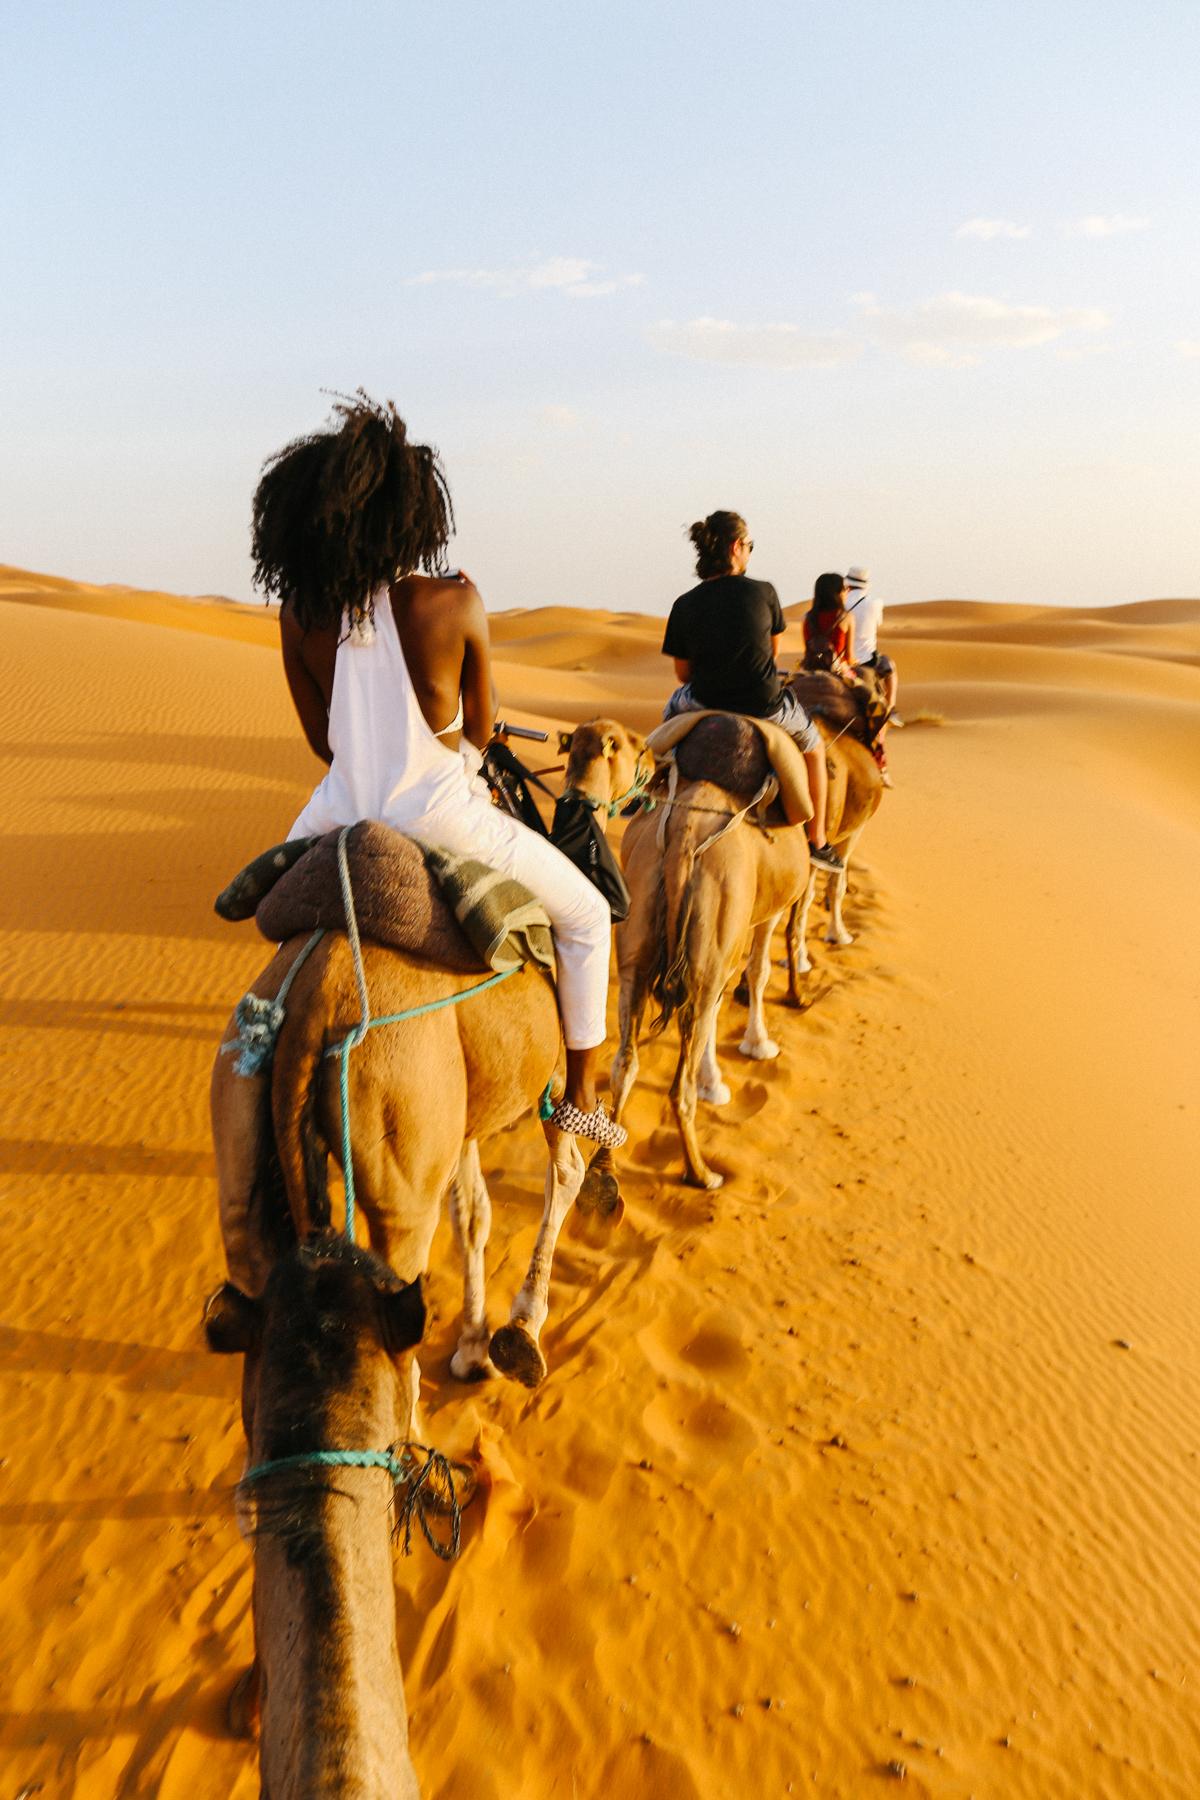 Spiritedpursuit_leelitumbe_morocco_saharadesert-1.jpg